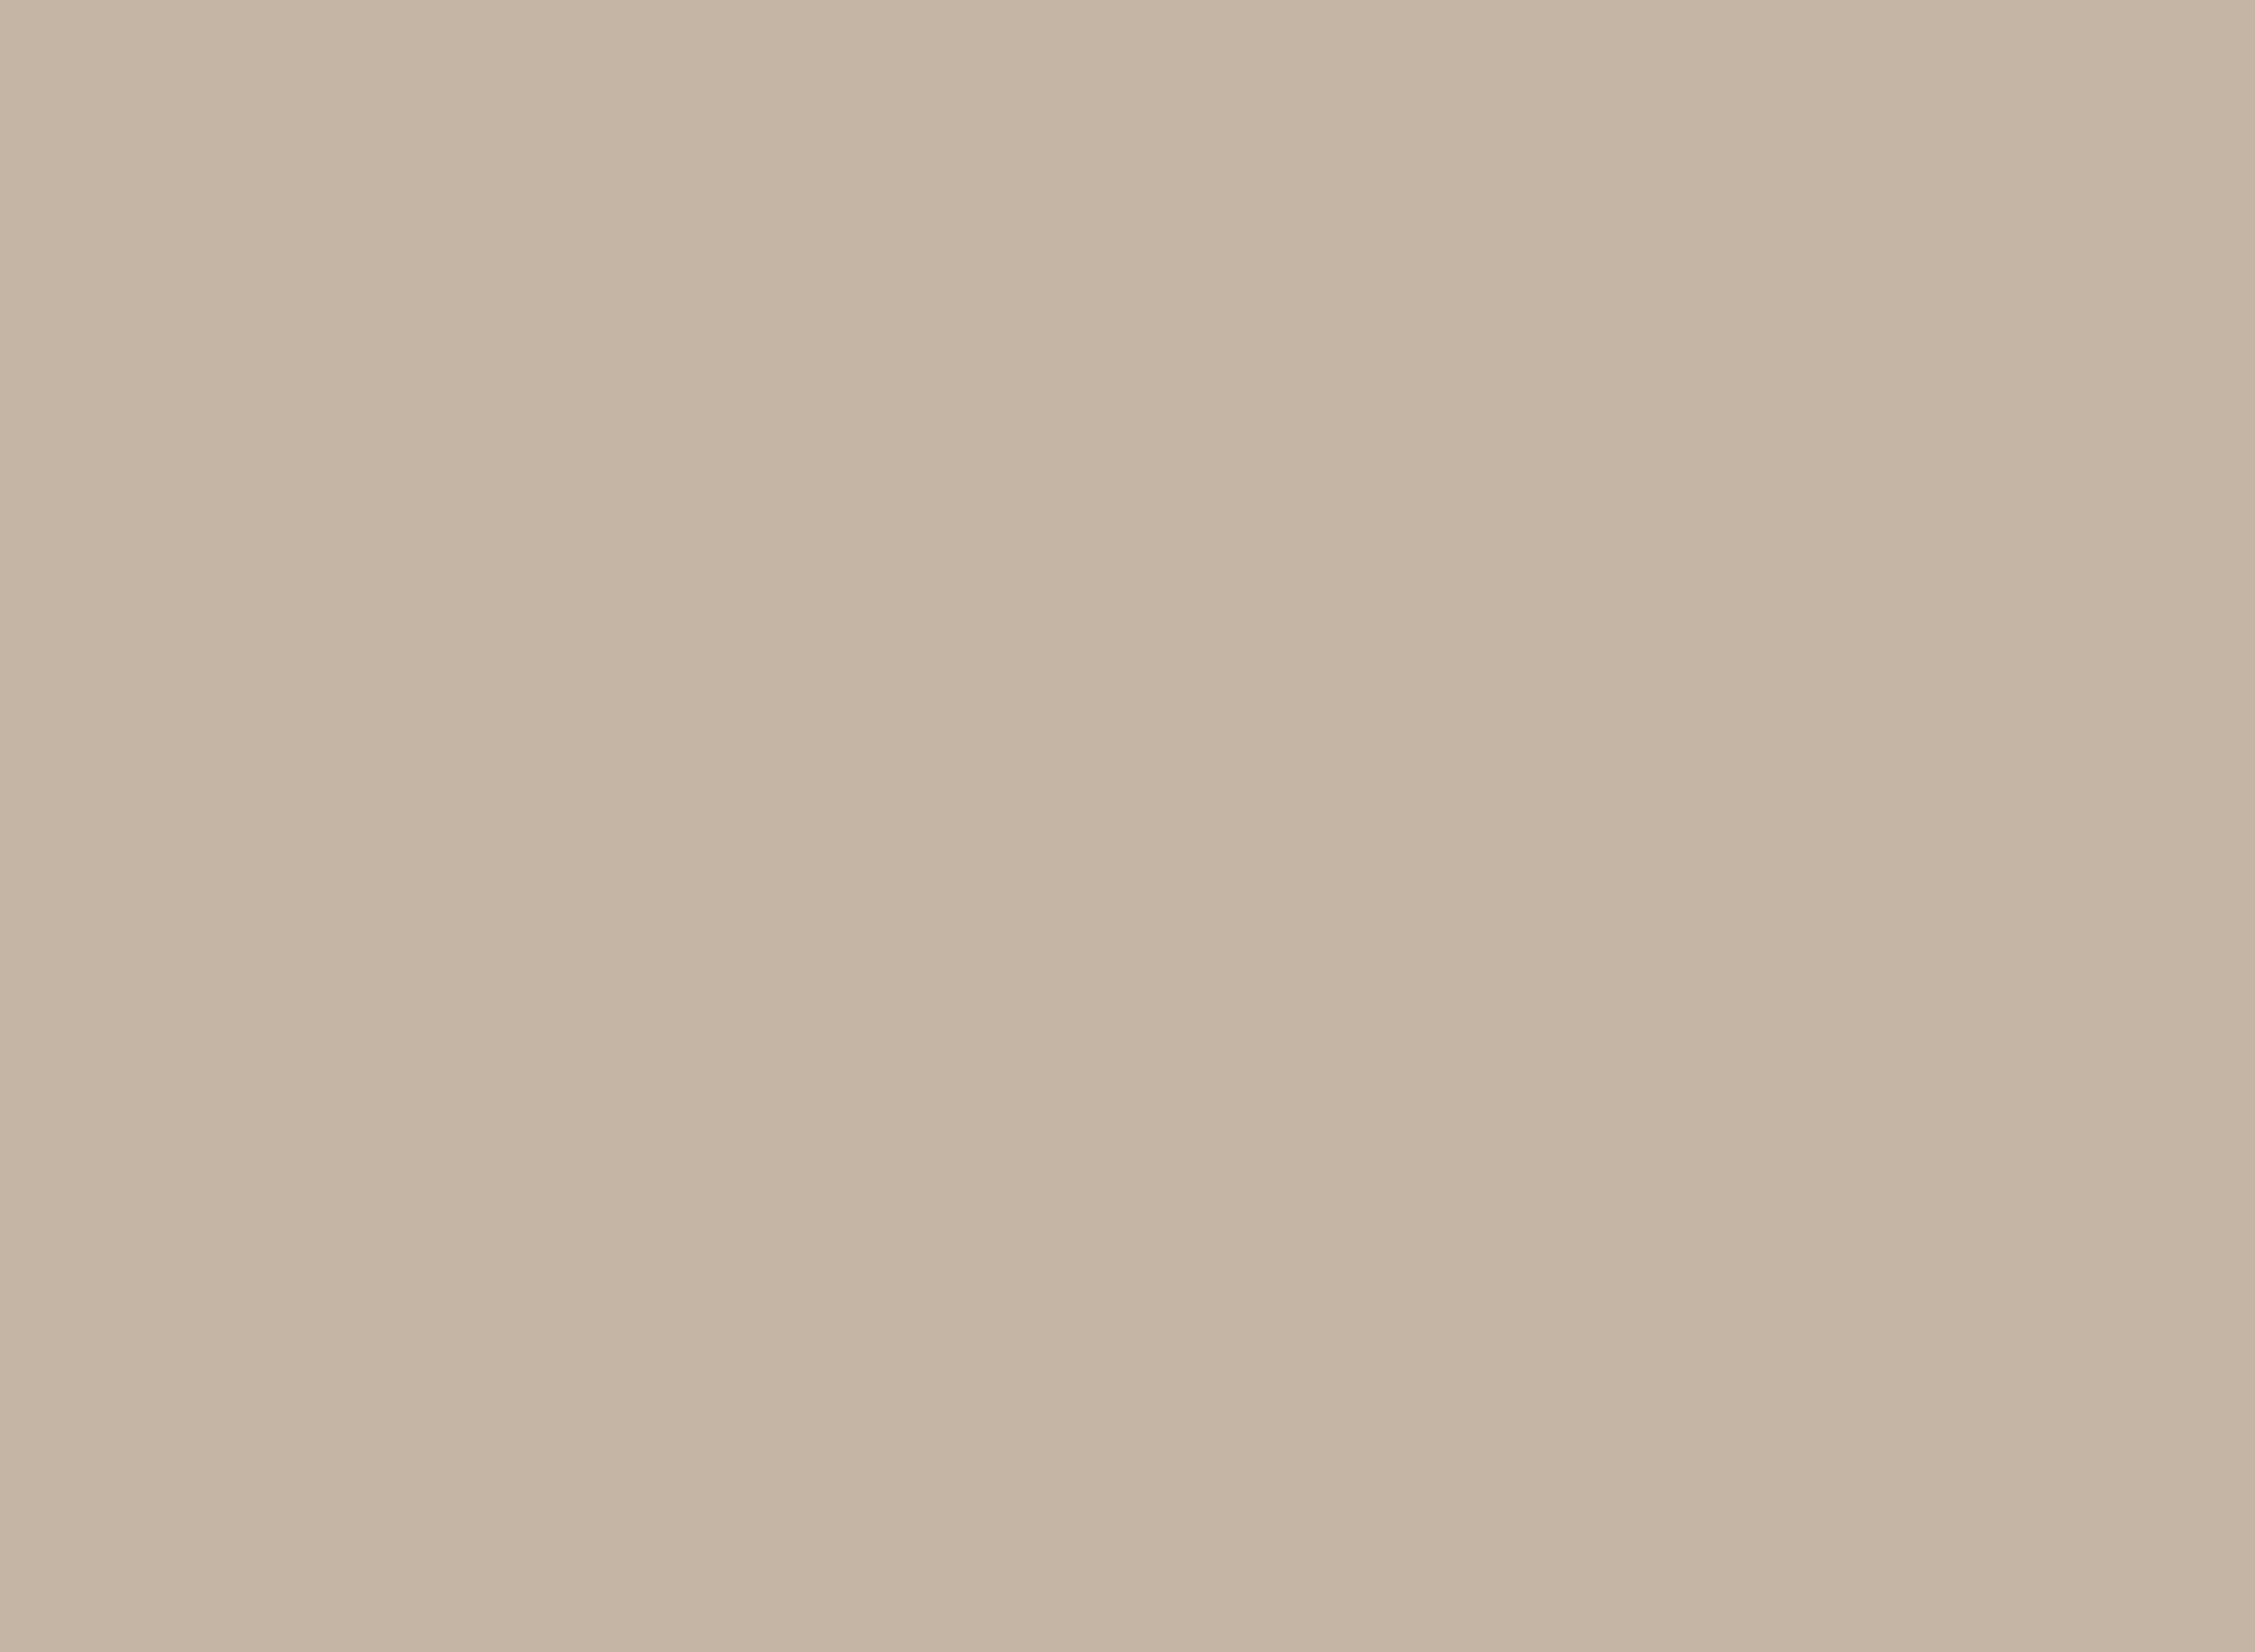 PSDS, Sand Sprenkel, ACHTUNG nicht abbildbar, 2farbig